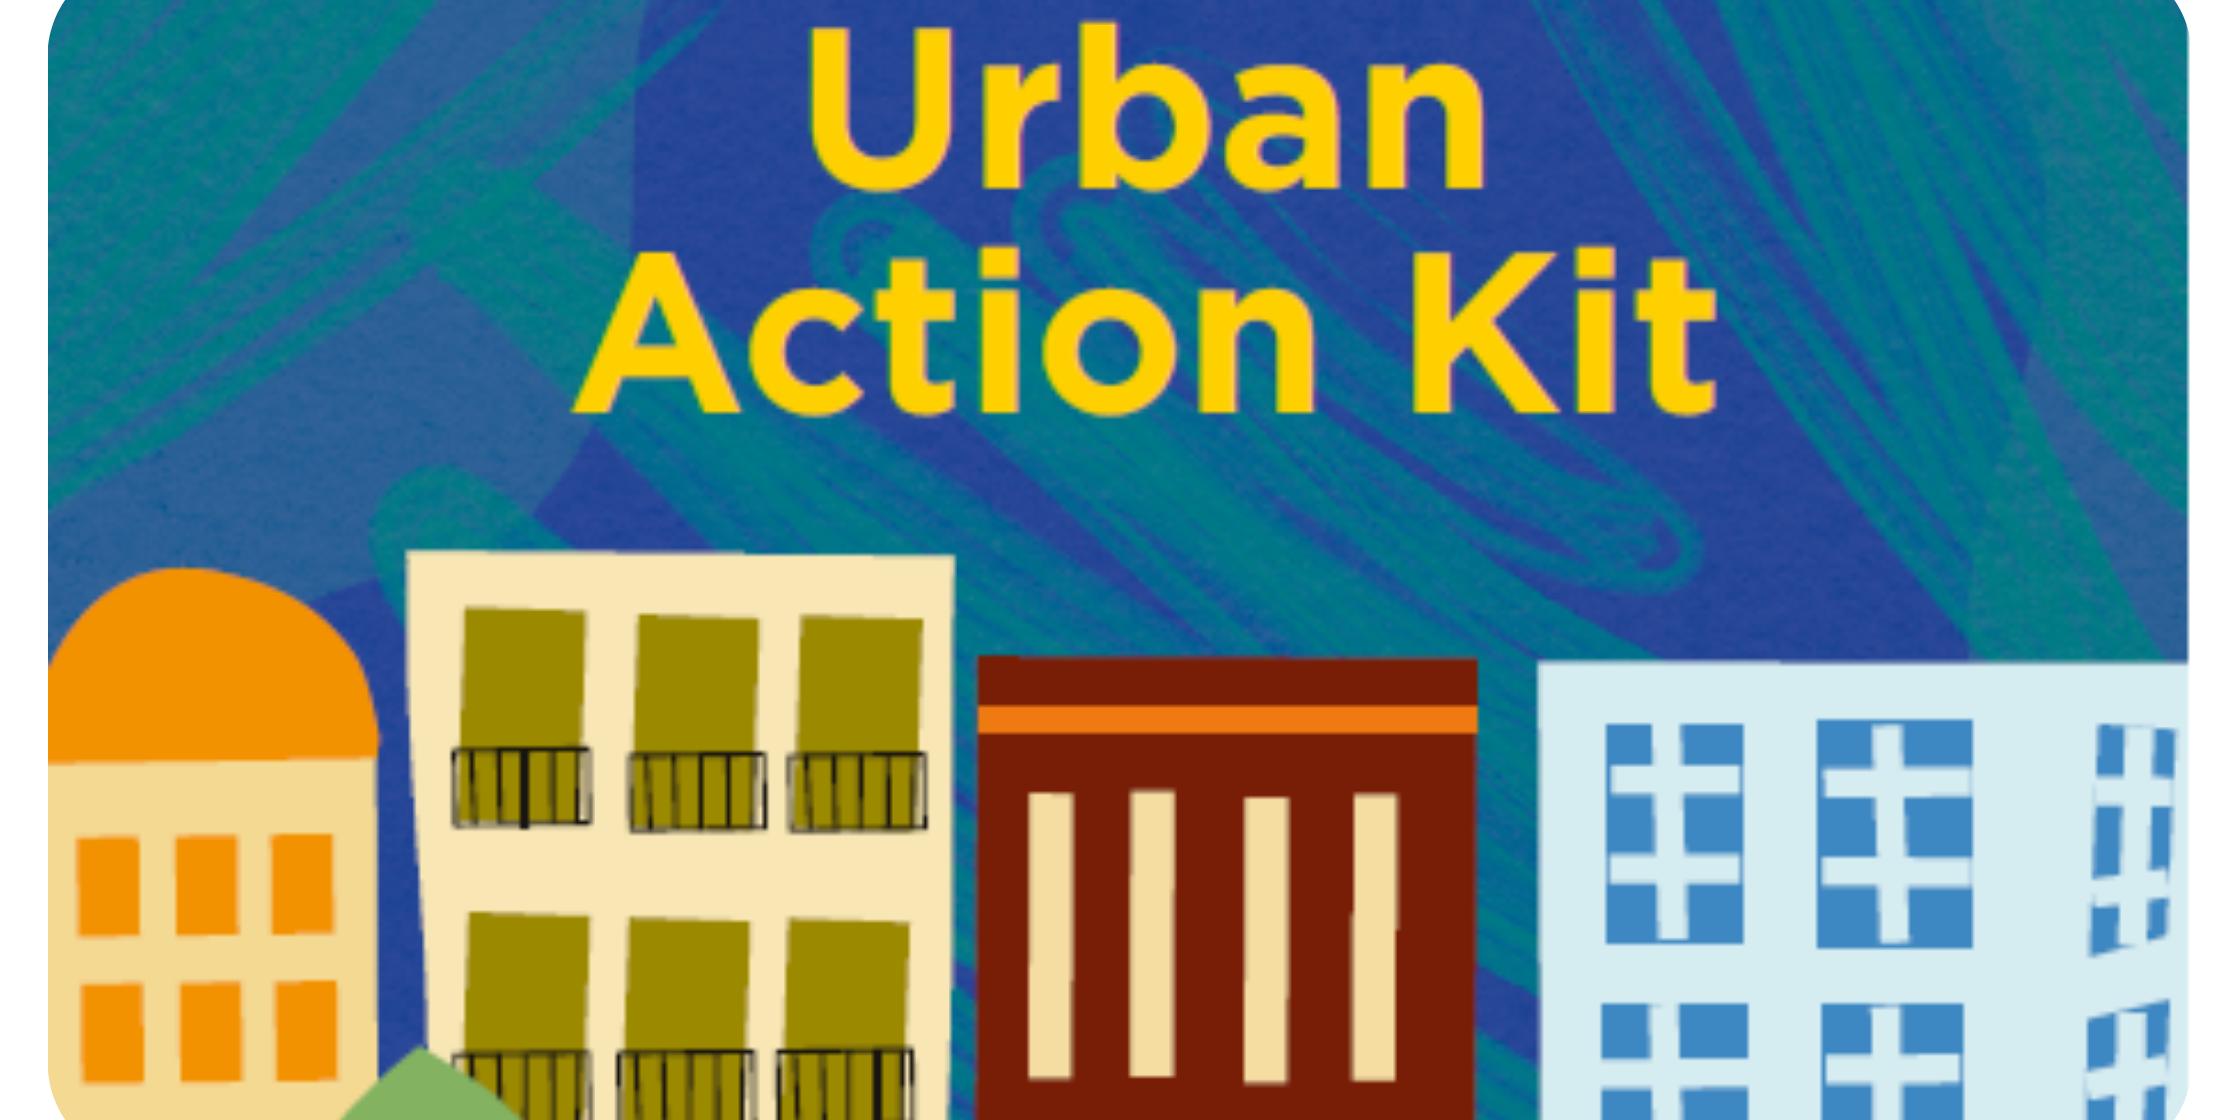 Urban Action Kit Cards